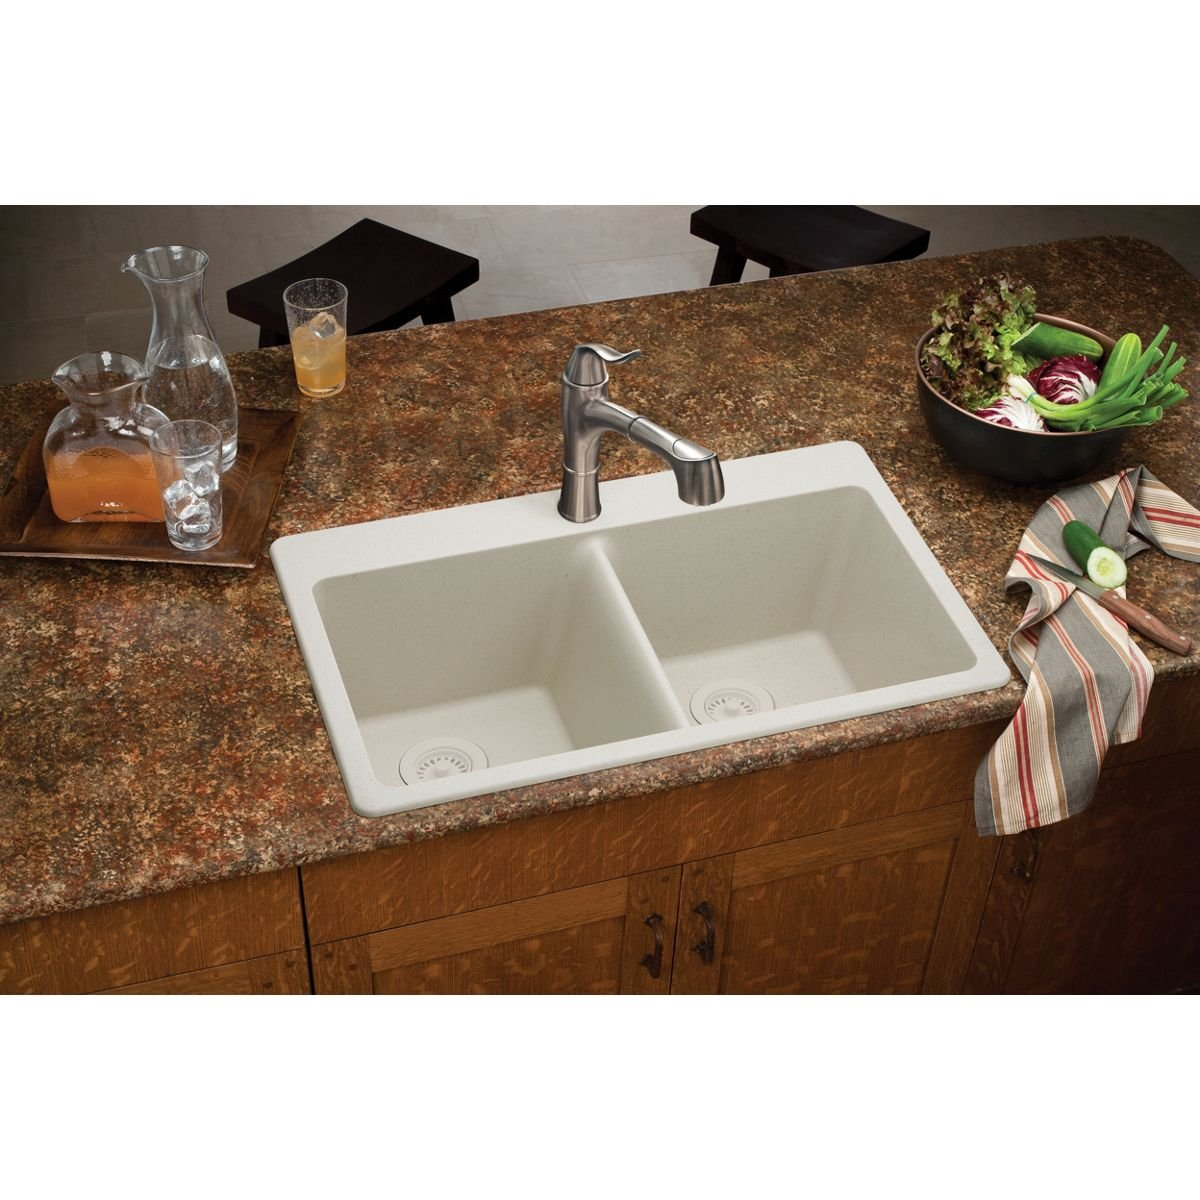 E granite sinks pros cons - Elkay Quartz Classic Elg3322mc0 Mocha Equal Double Bowl Top Mount Sink Double Bowl Sinks Amazon Com